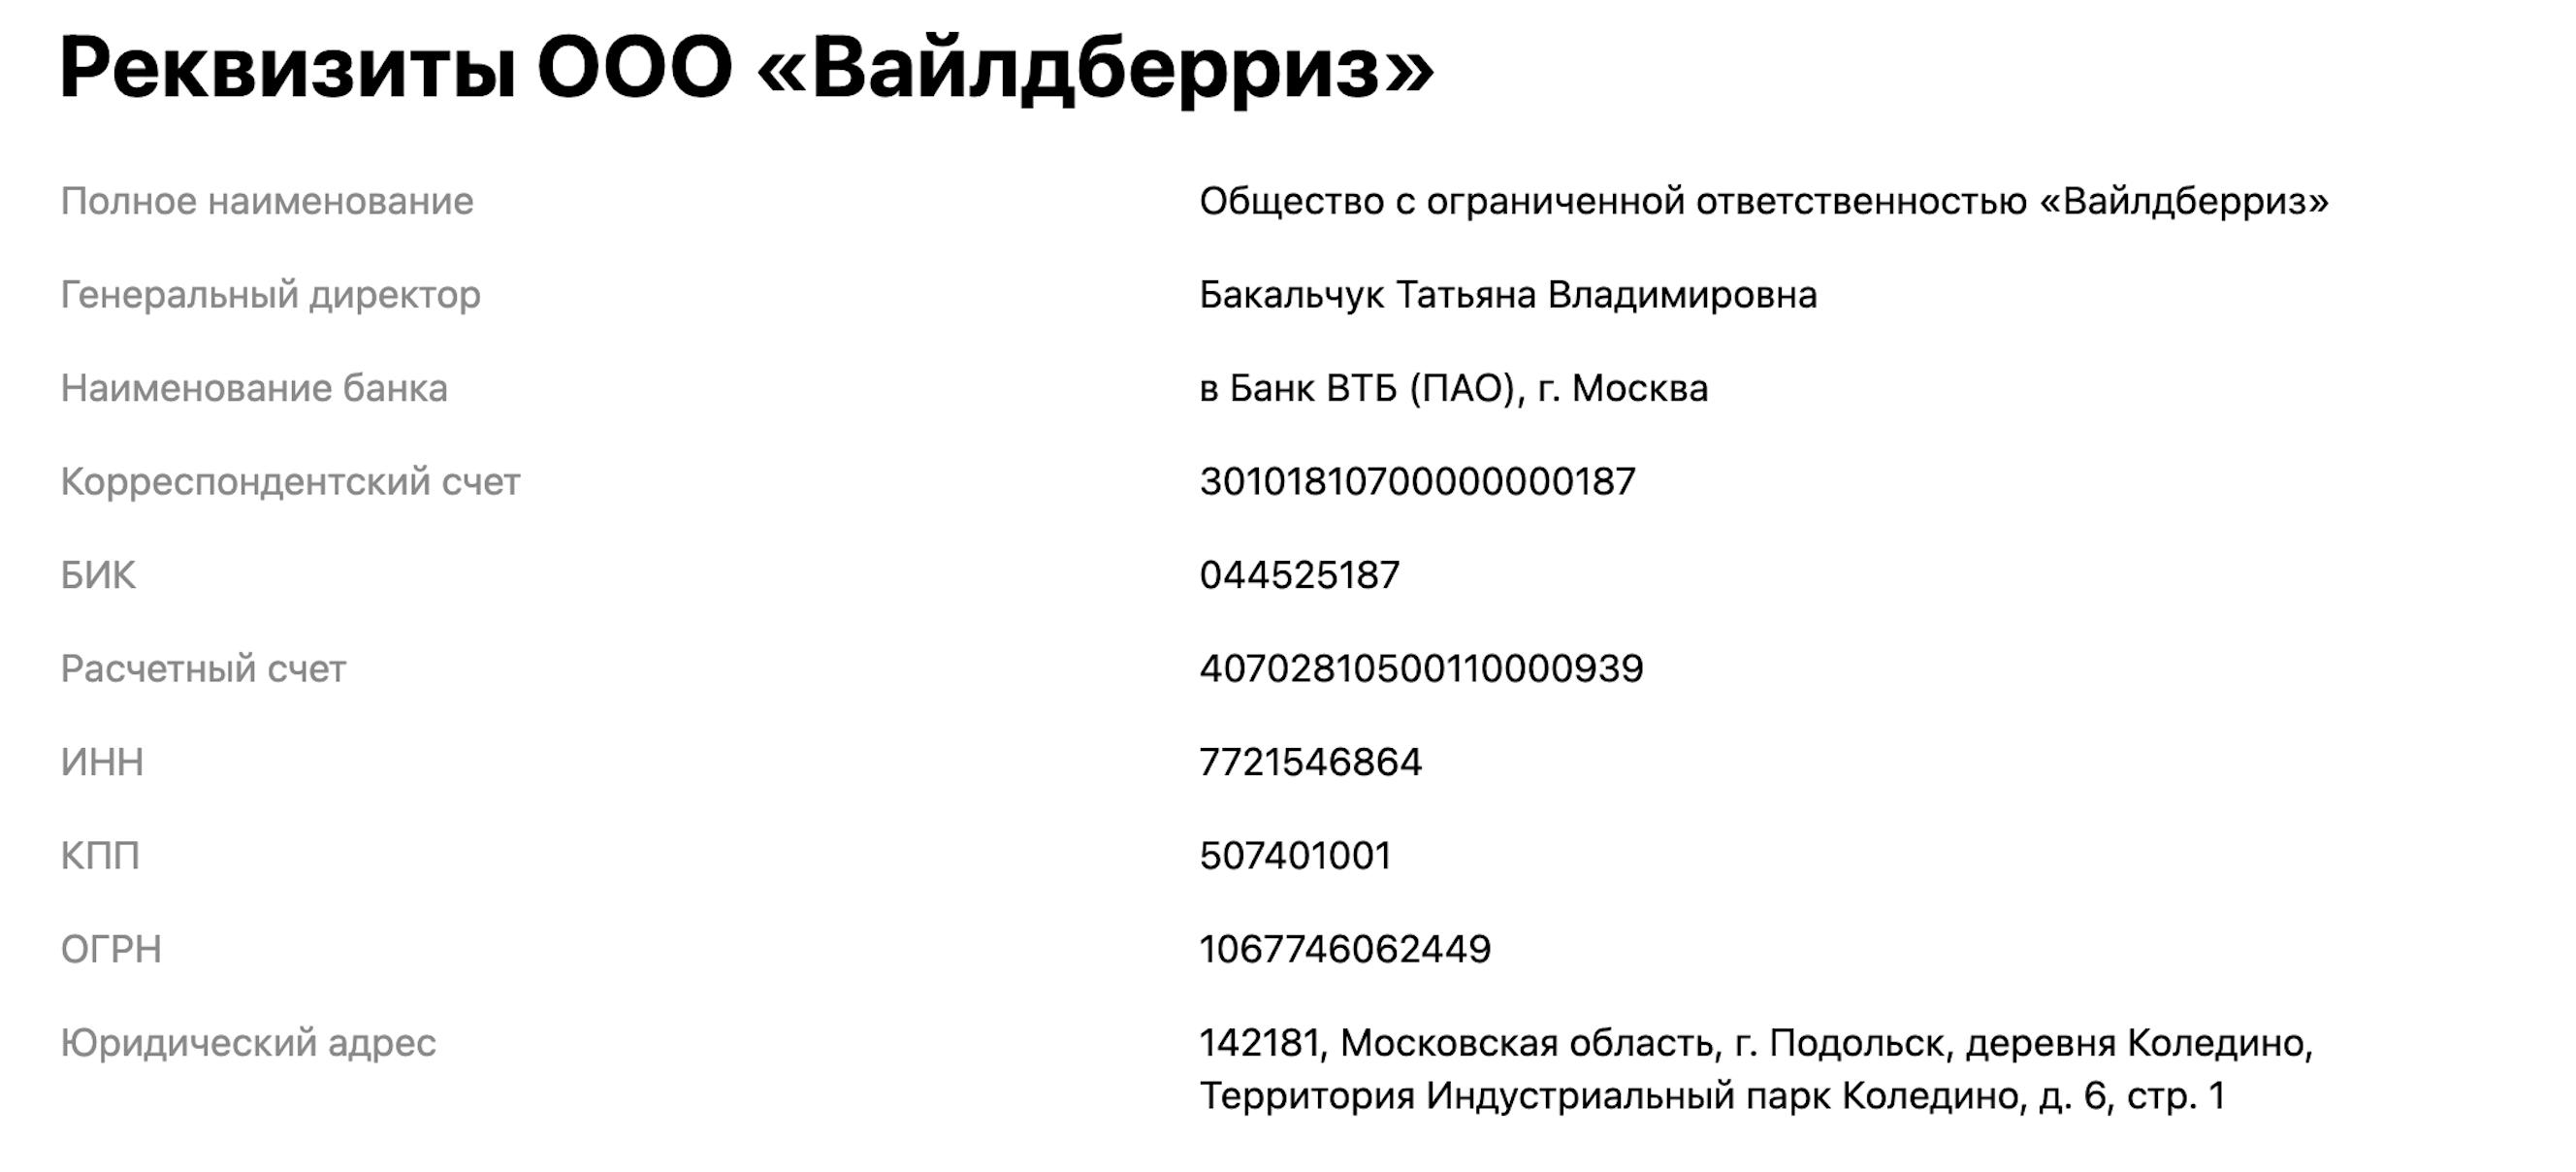 Реквизиты на странице «Контакты»